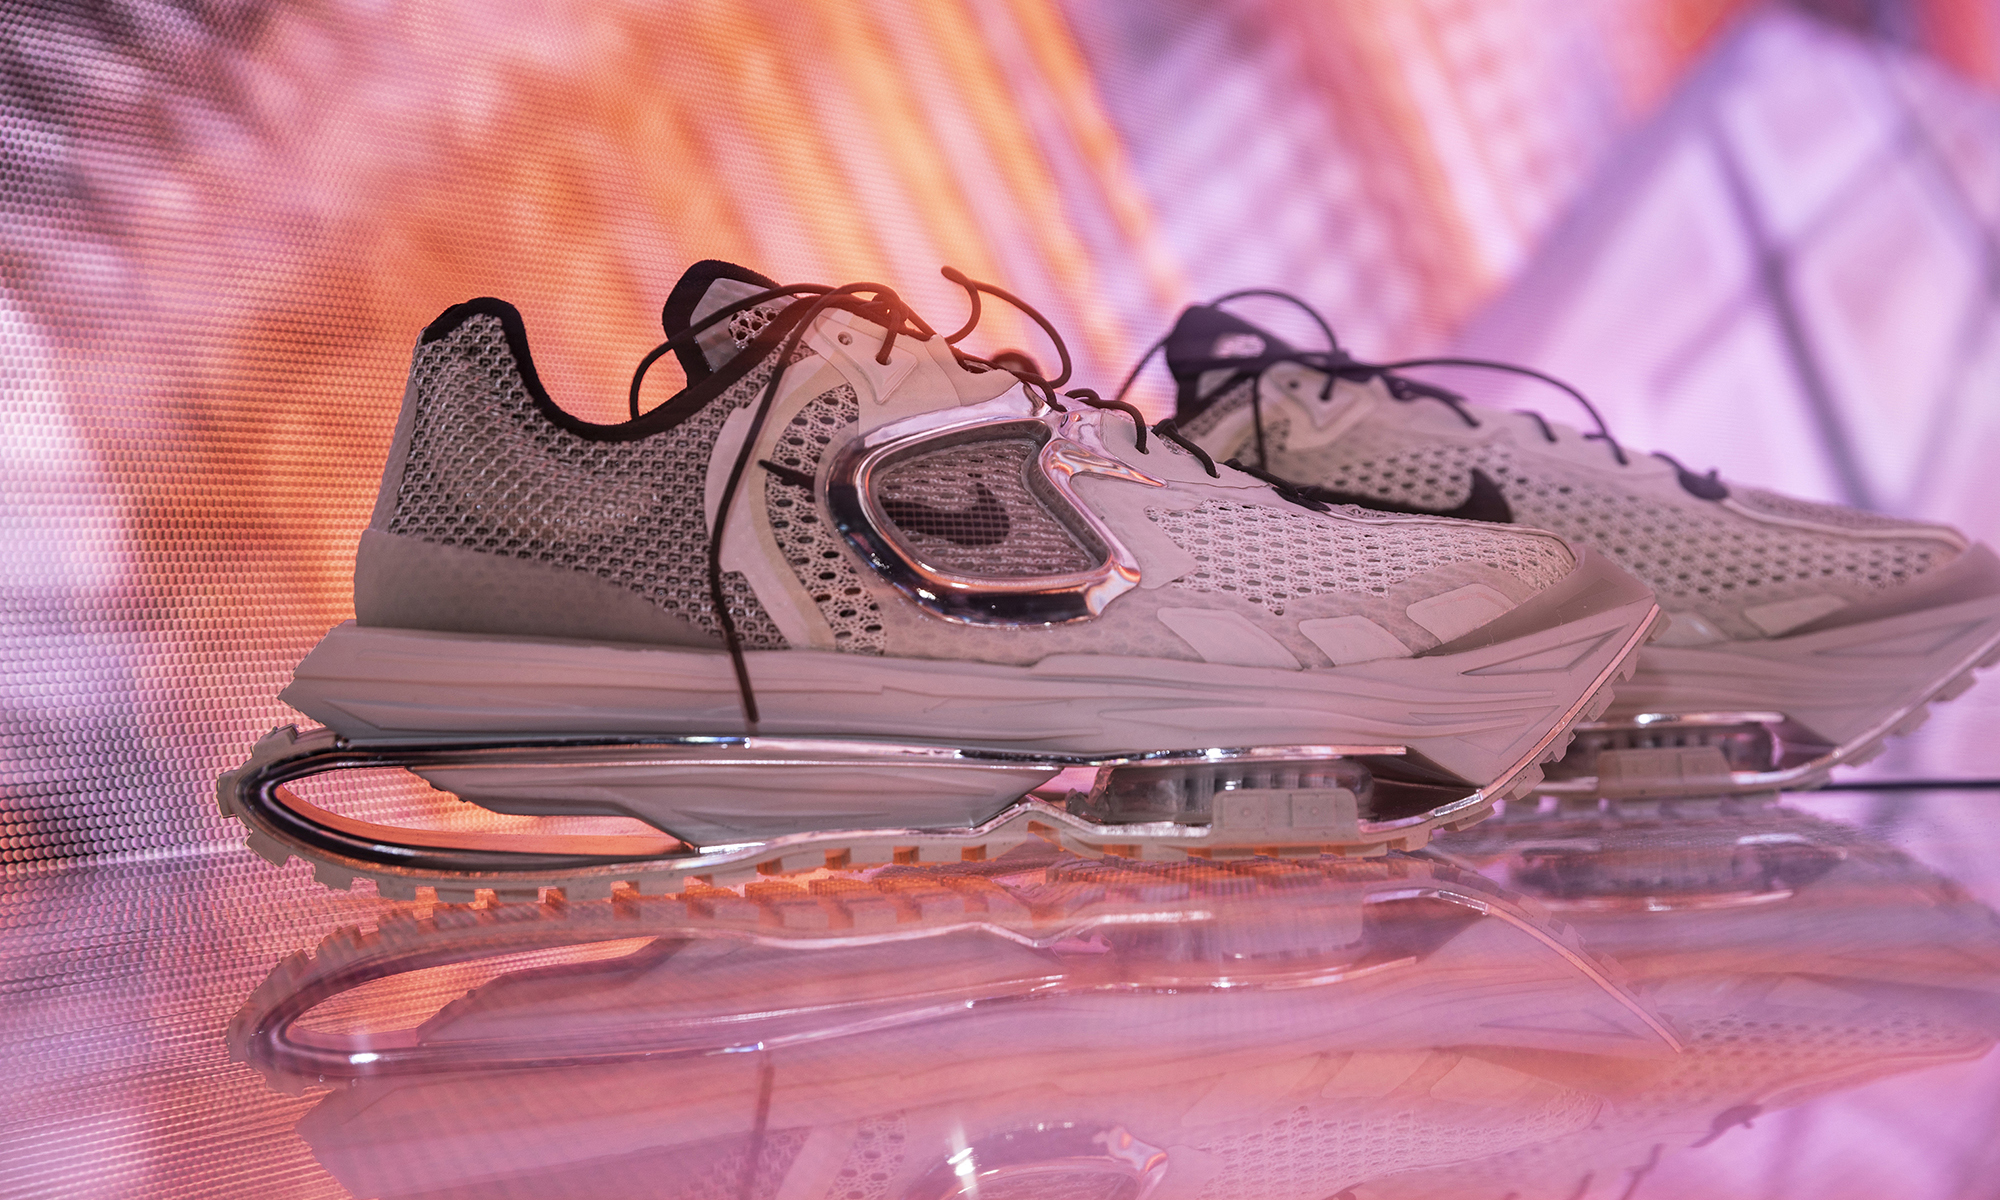 SKP-S 即将启动 Matthew M Williams x Nike Zoom MMW 4 抽签发售活动